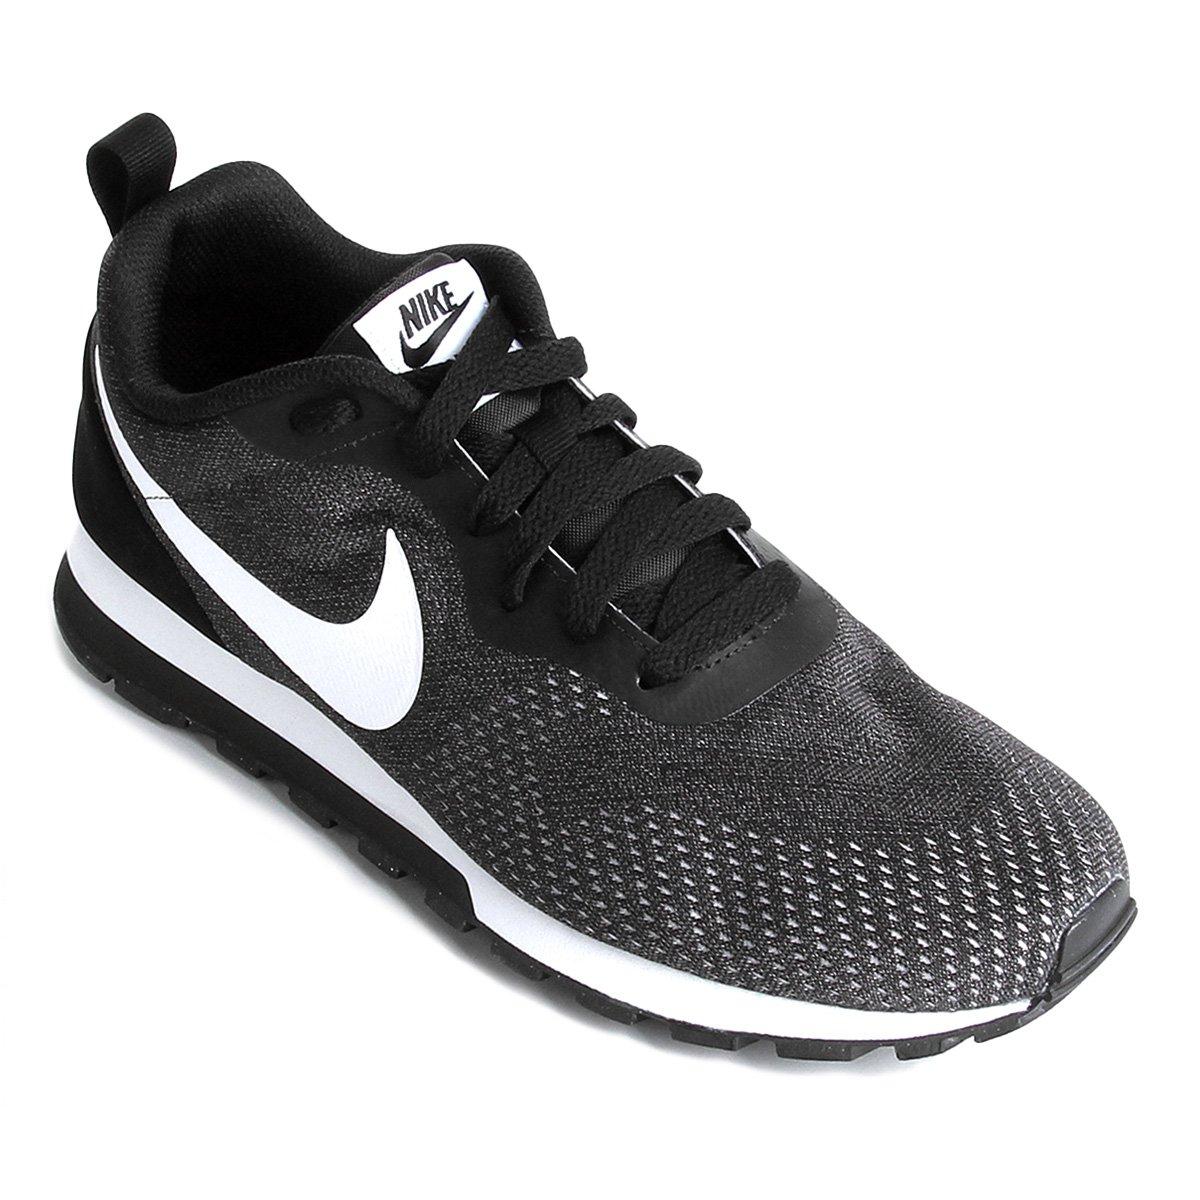 eacadade77 Runner 2 Masculino e Mesh Branco Preto Nike Tênis Md Eng q7AwPTp ...